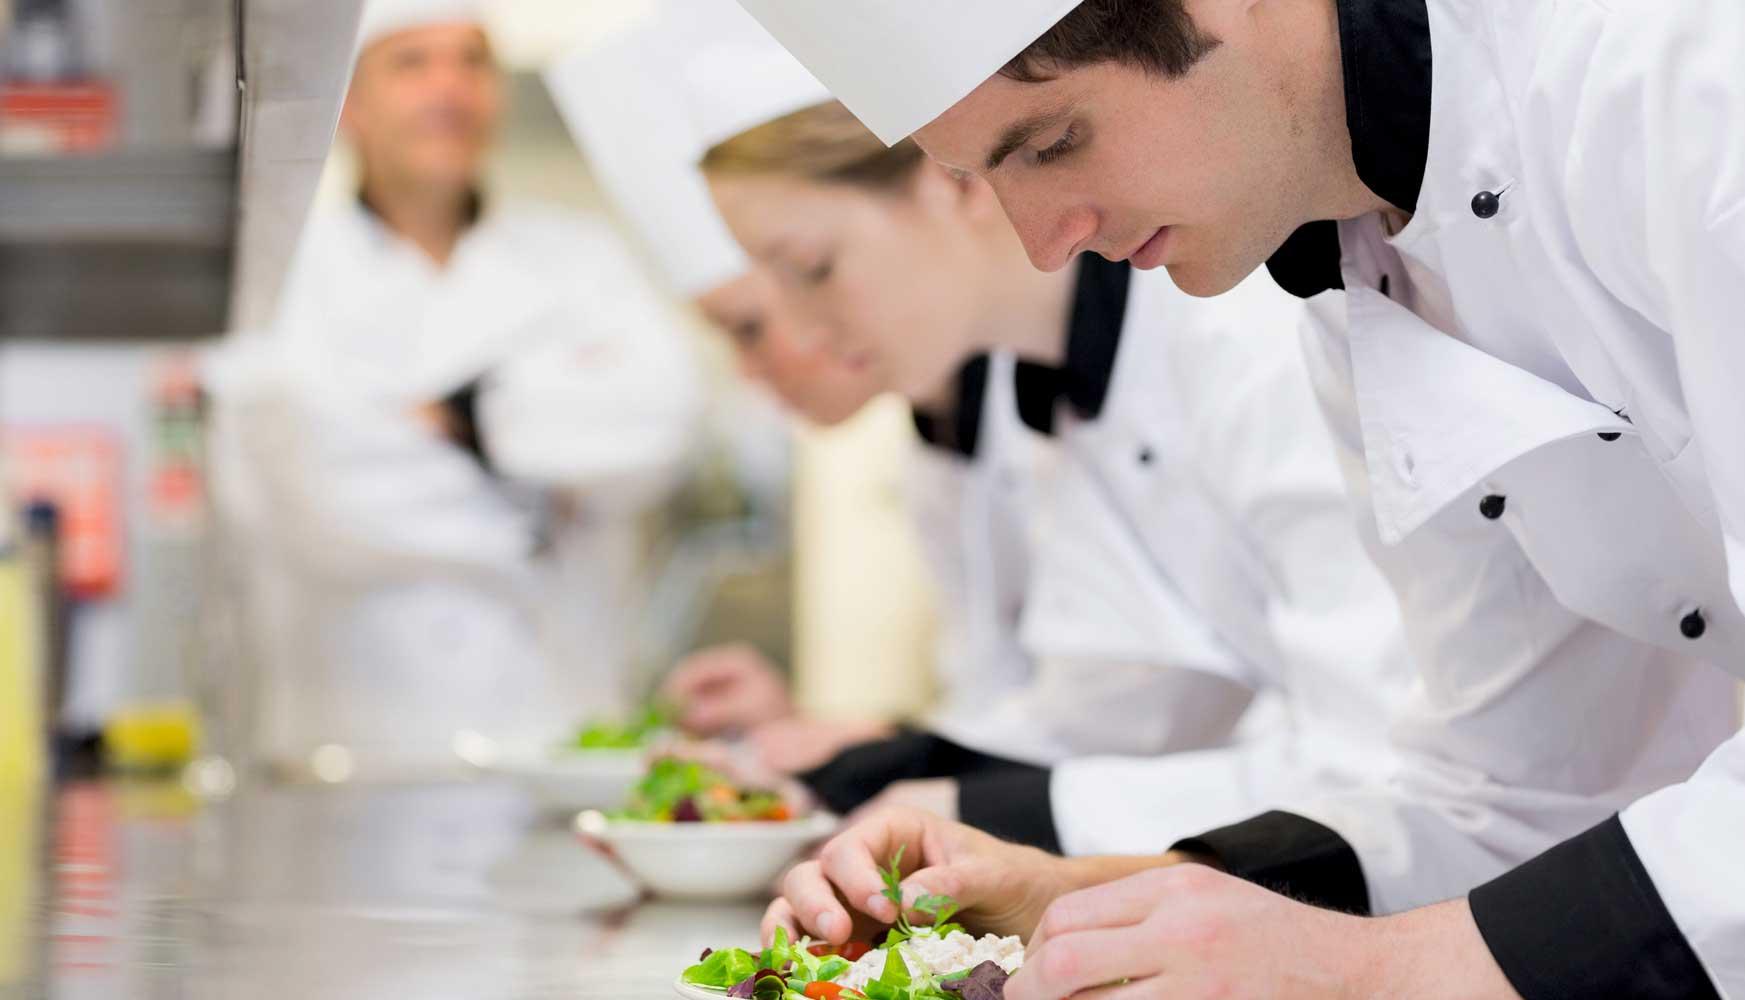 Epa-Escola-Profissional-Agricultura-Tecnologias_Curso_Tecnico-Profissional-Cozinha-Pastelaria